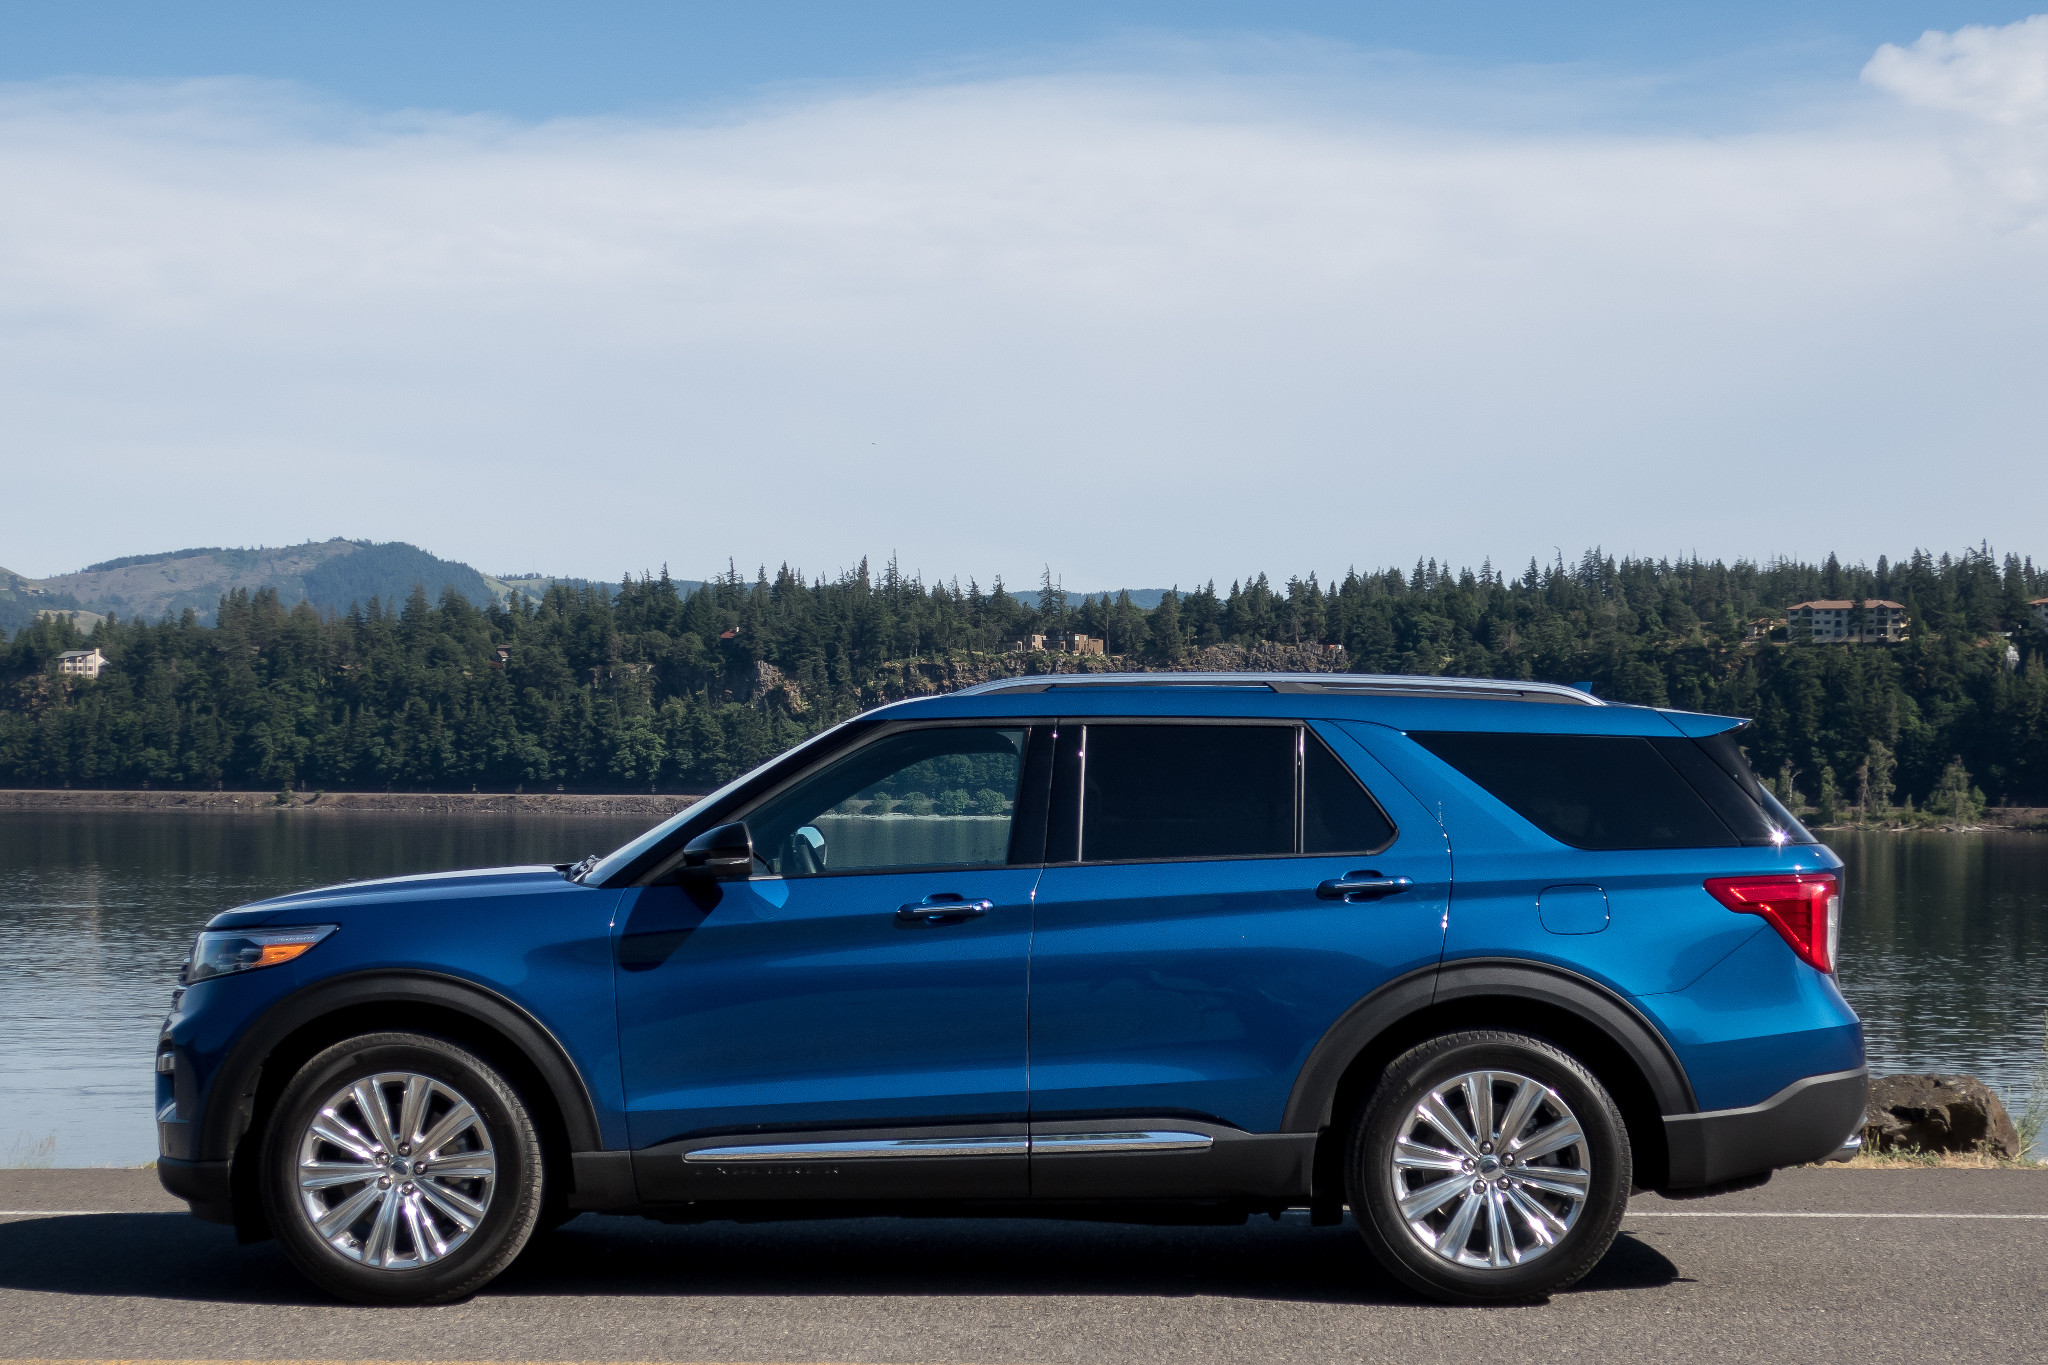 07-ford-explorer-hybrid-limited-2020-blue--exterior--profile.jpg